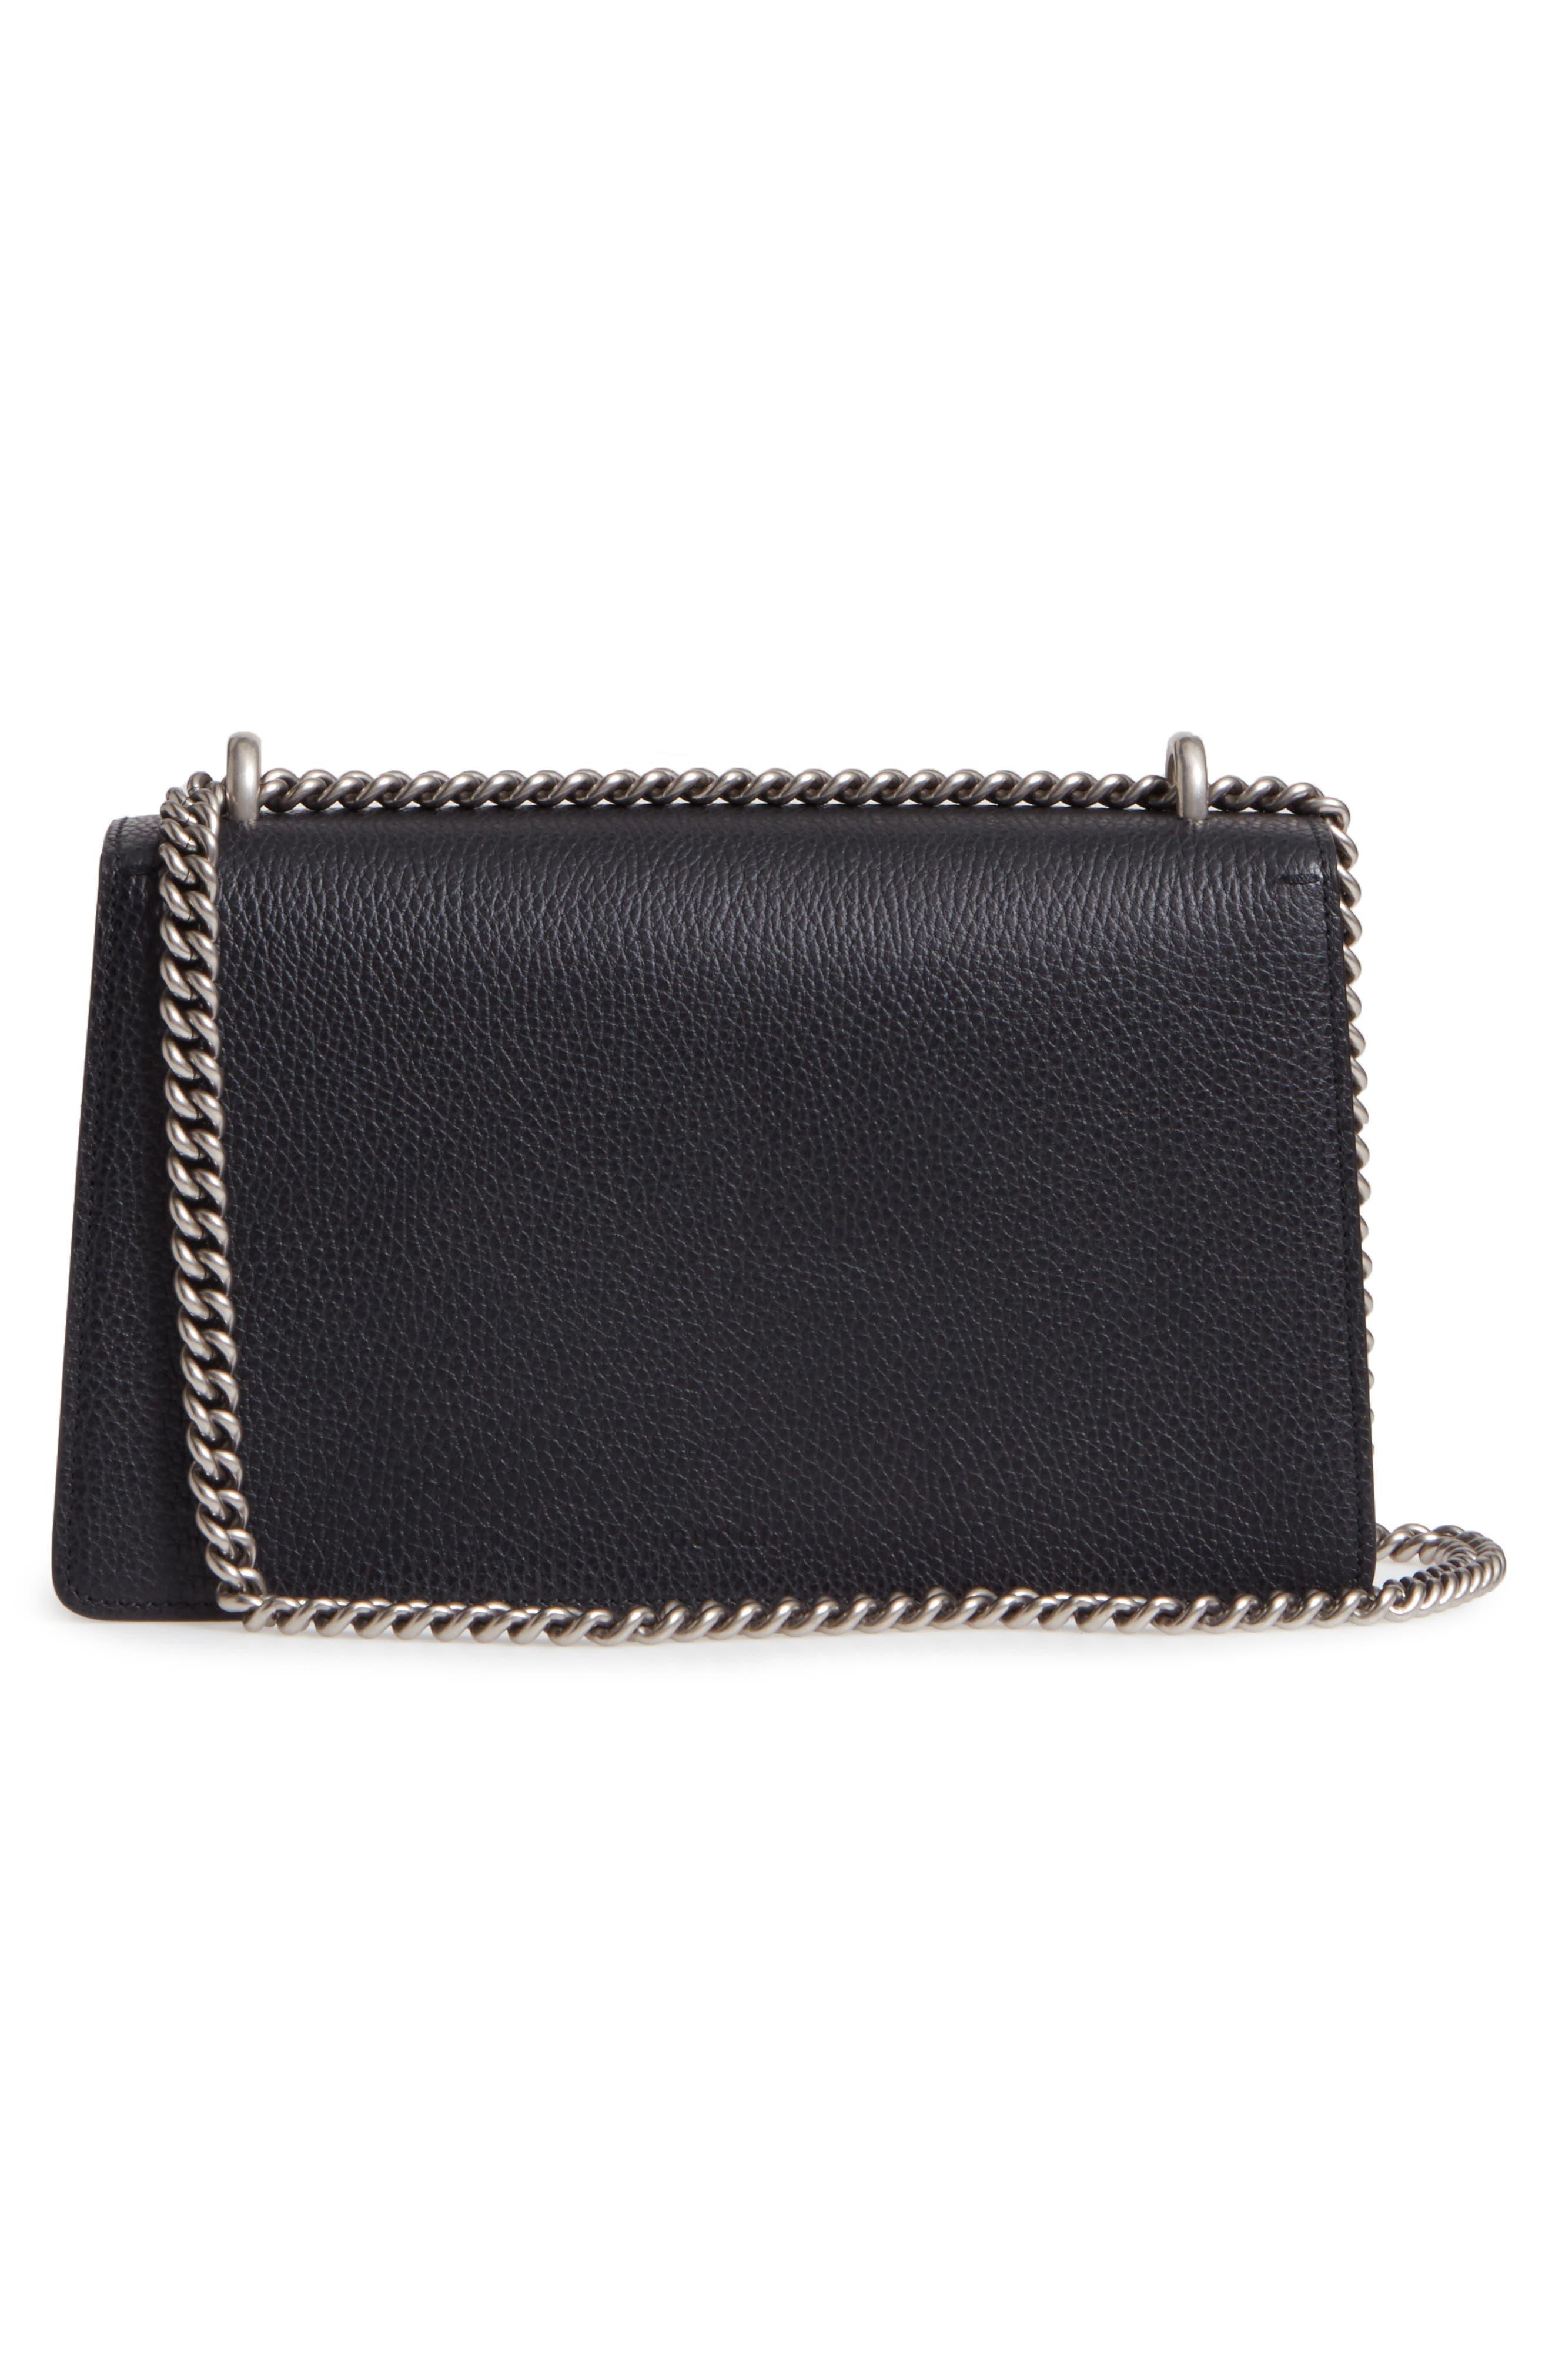 Small Dionysus Leather Shoulder Bag,                             Alternate thumbnail 3, color,                             8176 NERO/BLACK DIAMOND